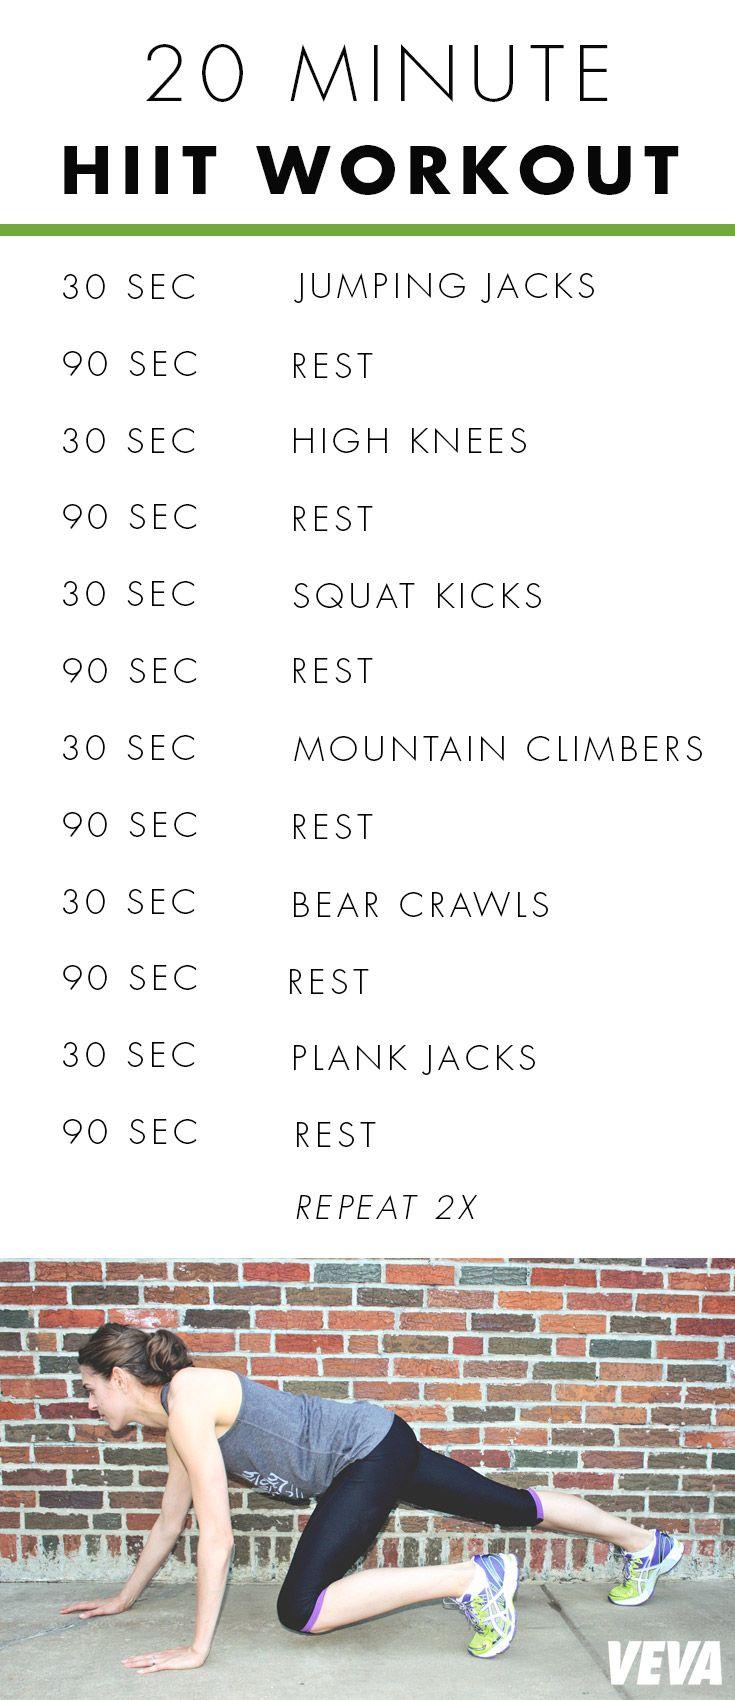 20 Minute HIIT Workout   Veva